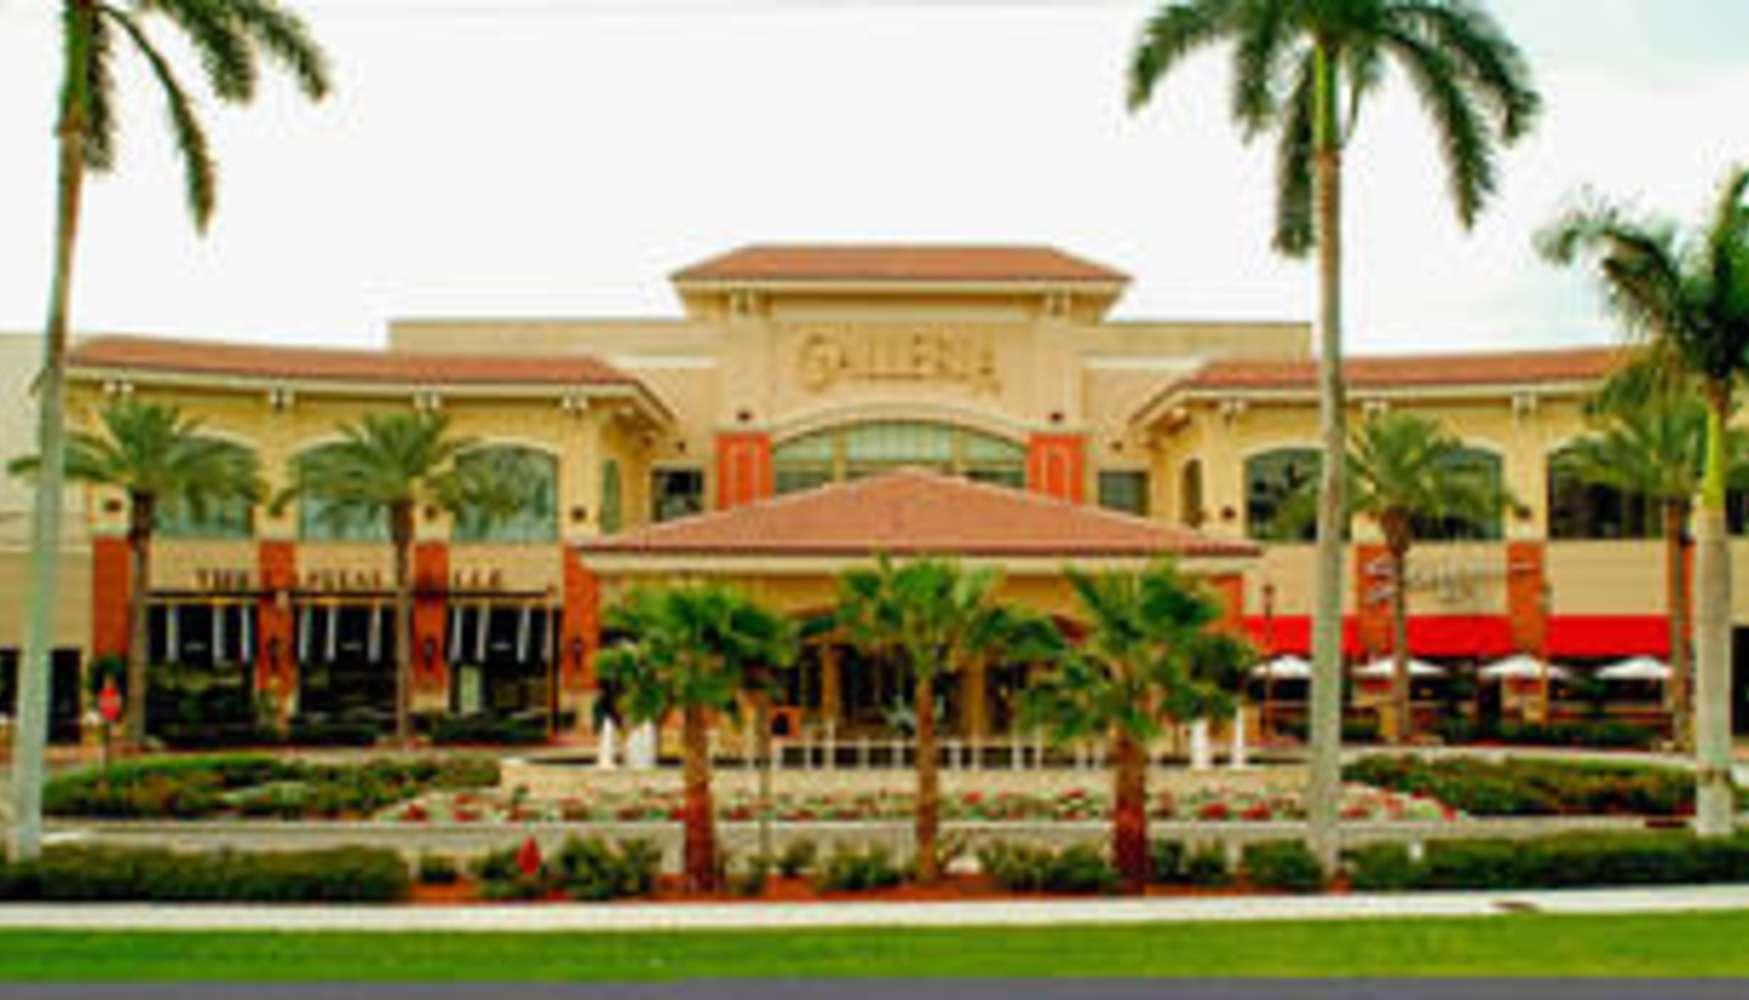 Retail Fort lauderdale, 33304 - Galleria at Fort Lauderdale